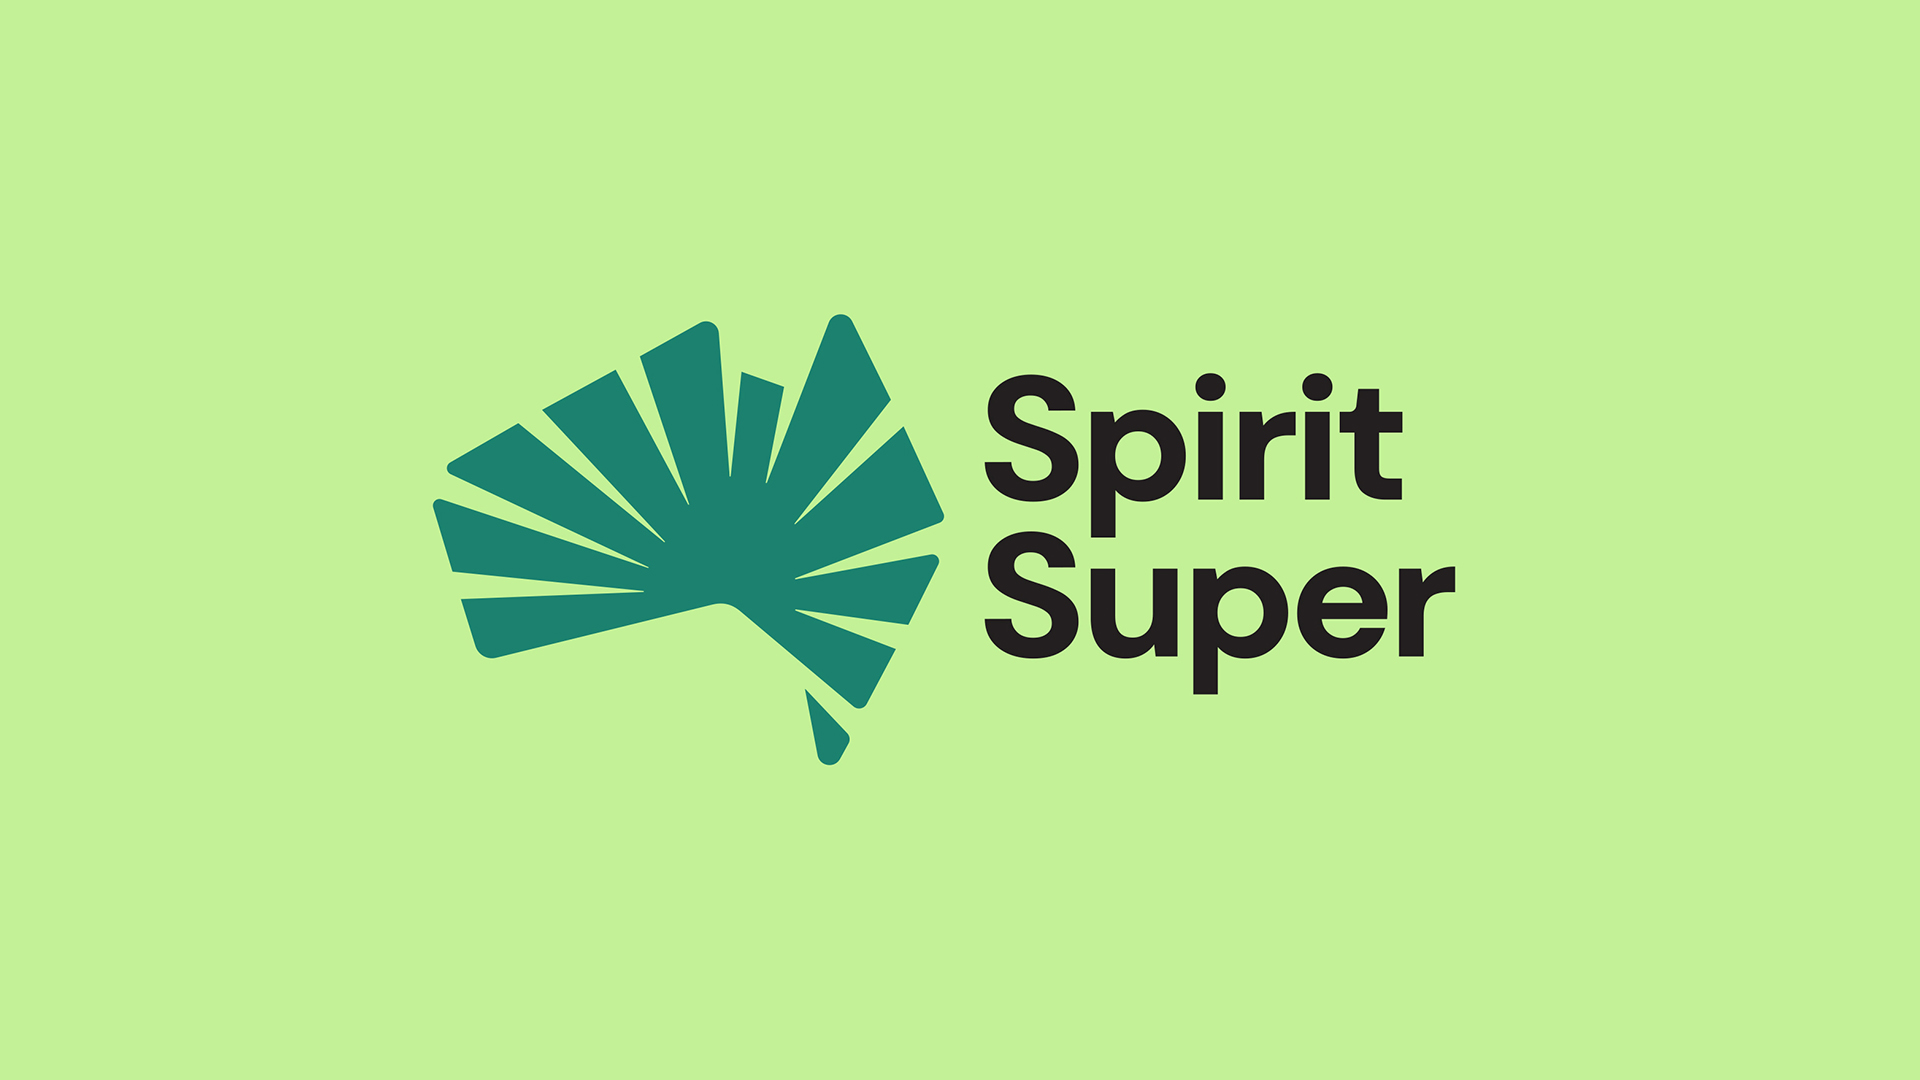 Spirit Super Brand Identity Created by Hulsbosch